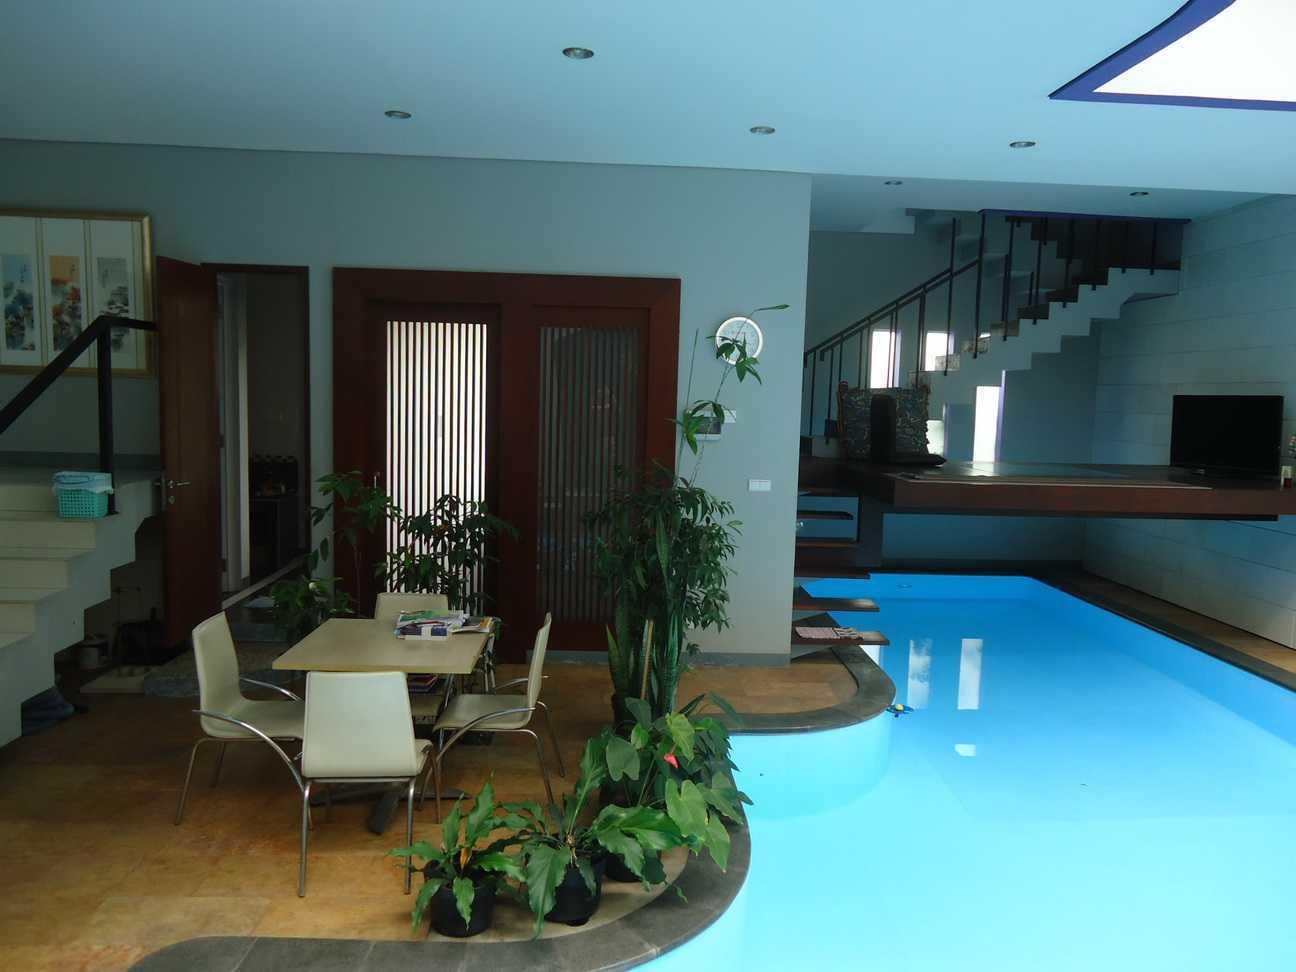 Budi Dharma The Relaxation House Gelong Selatan - Tomang Gelong Selatan - Tomang Gelong-Selatan-10   23859